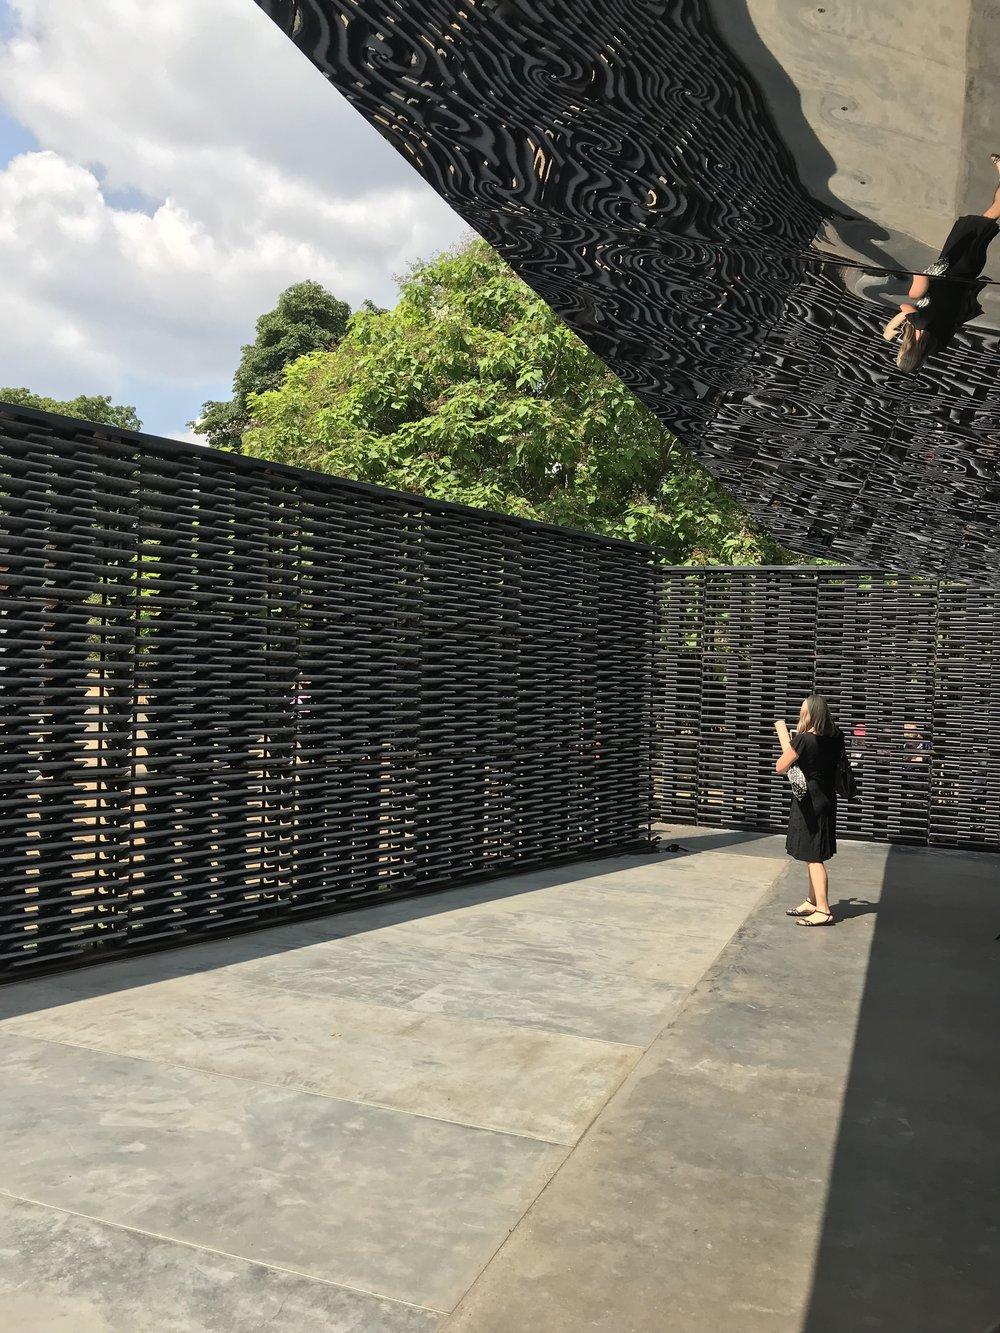 Serpentine Gallery - Summer Pavilion, designed by Architect Frida Escobedo